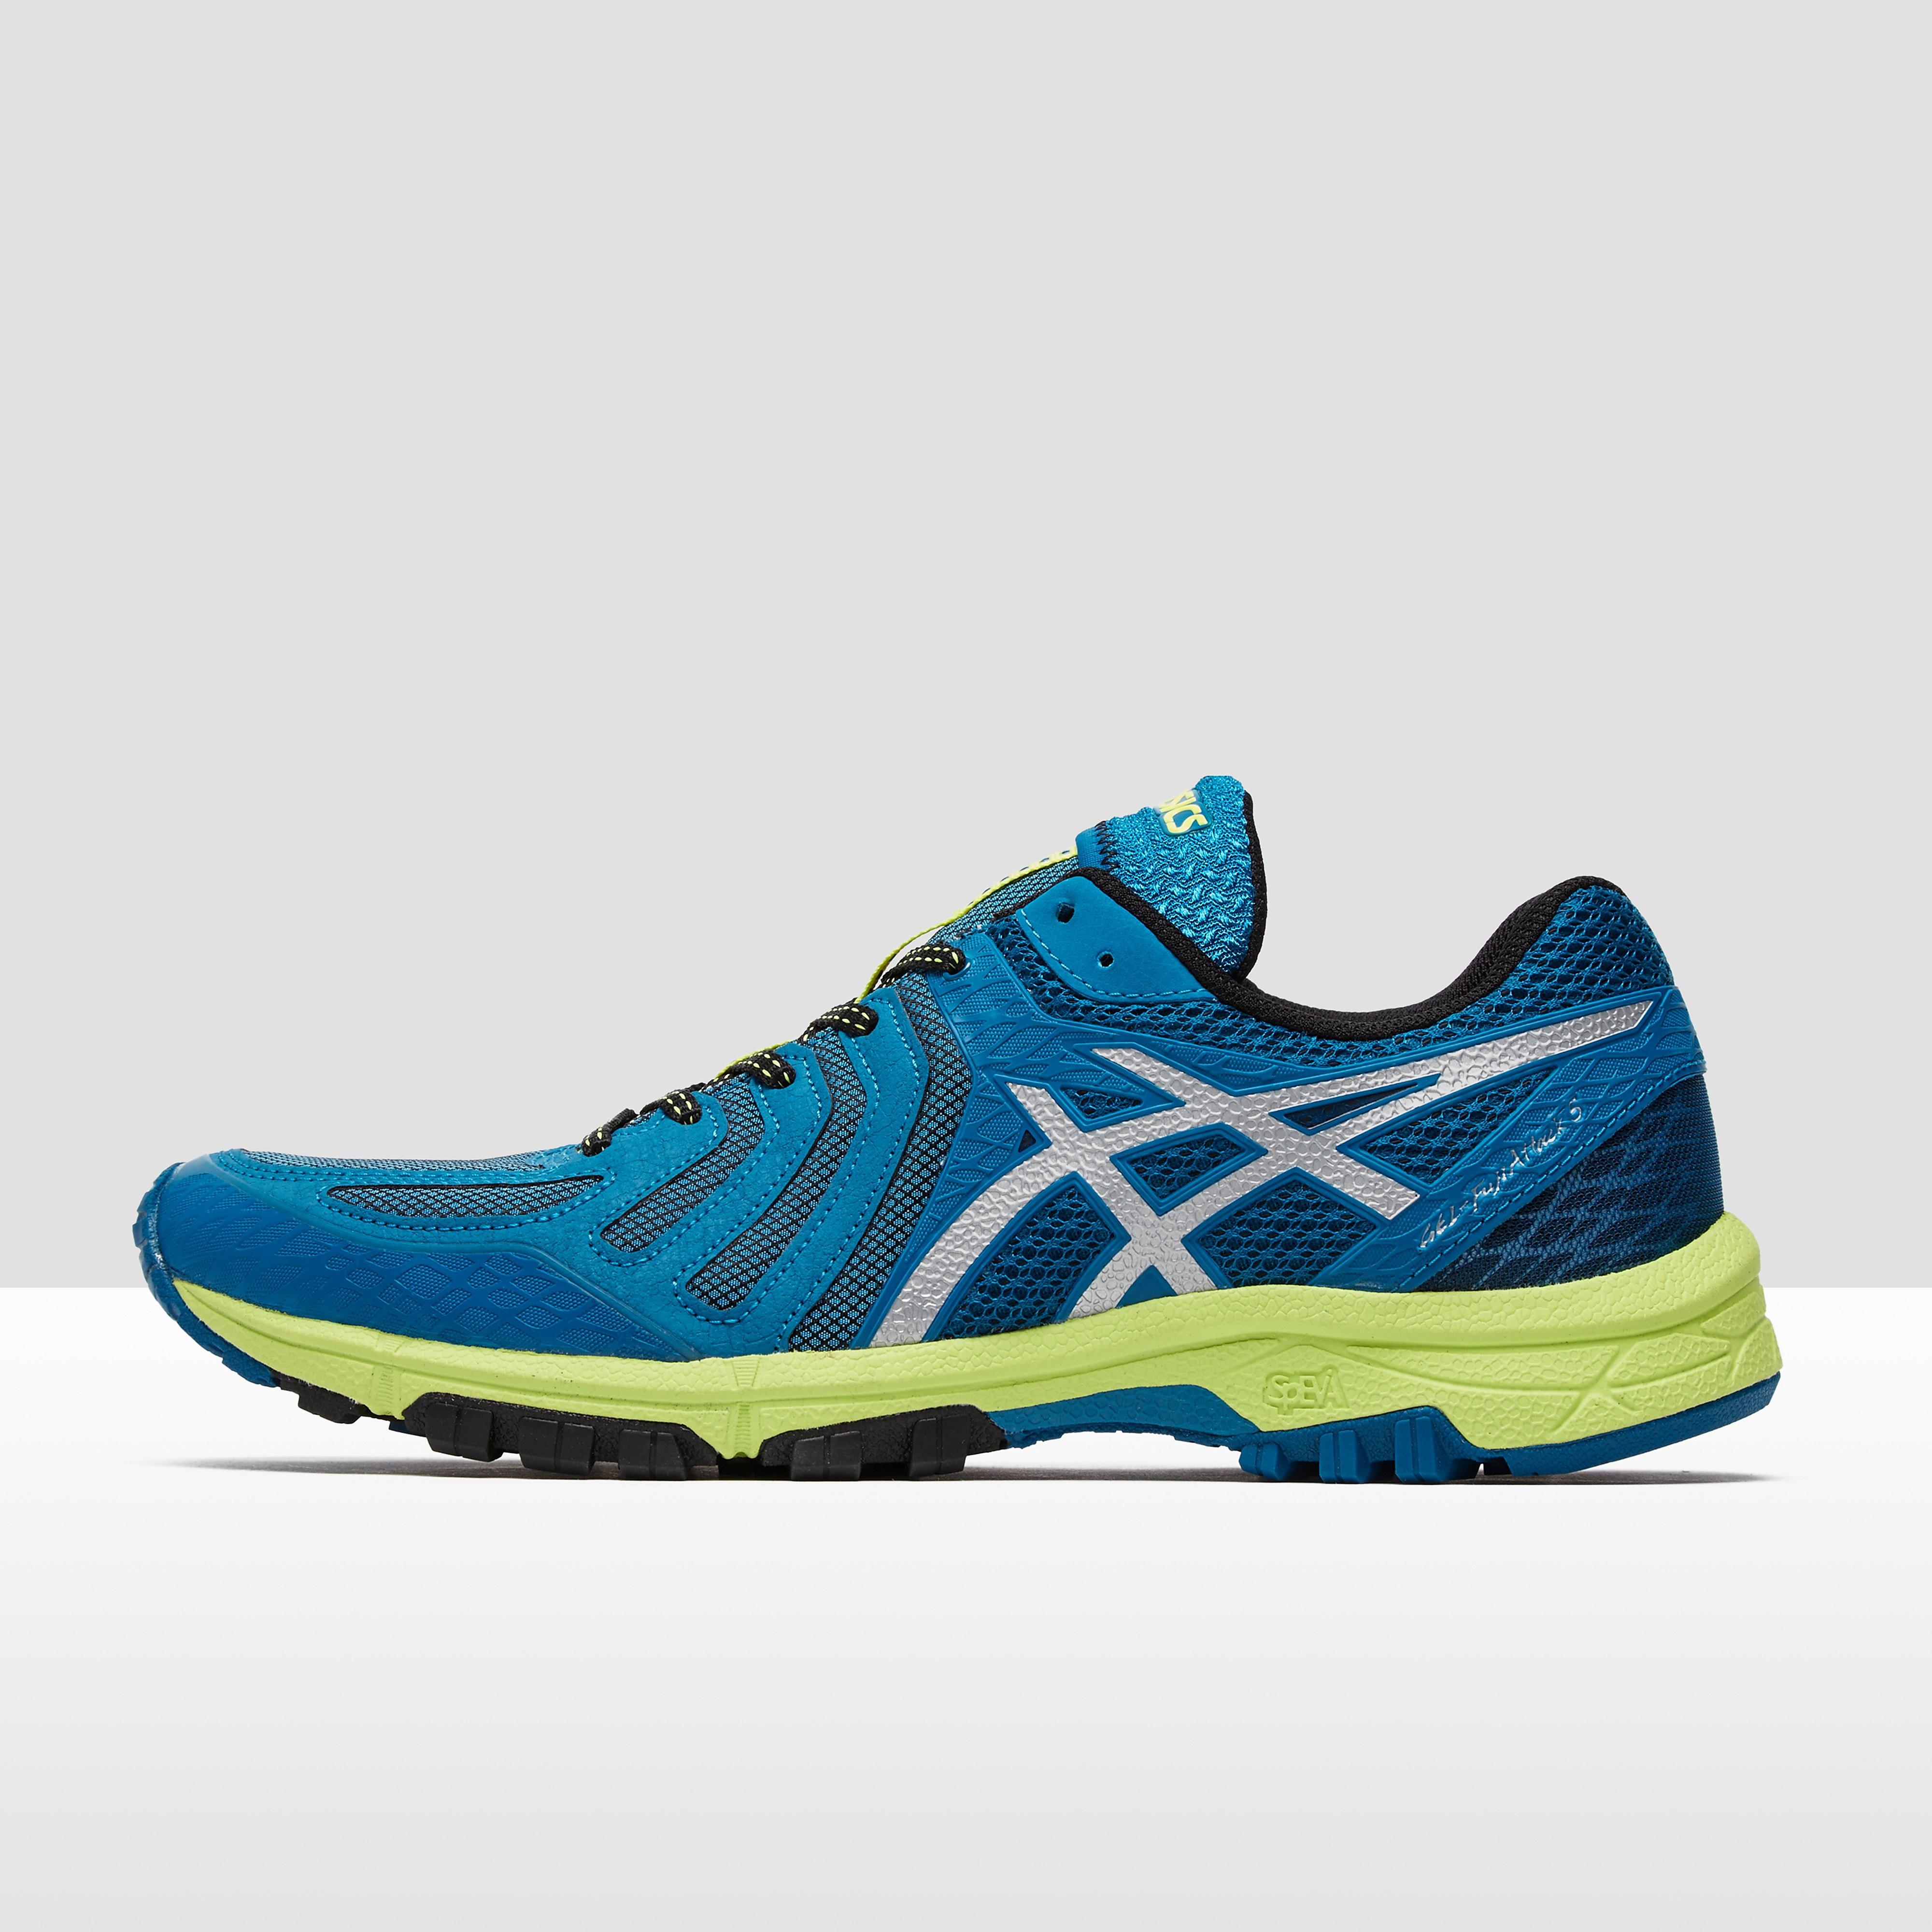 Asics Men's Gel FujiAttack 5 Running Shoes